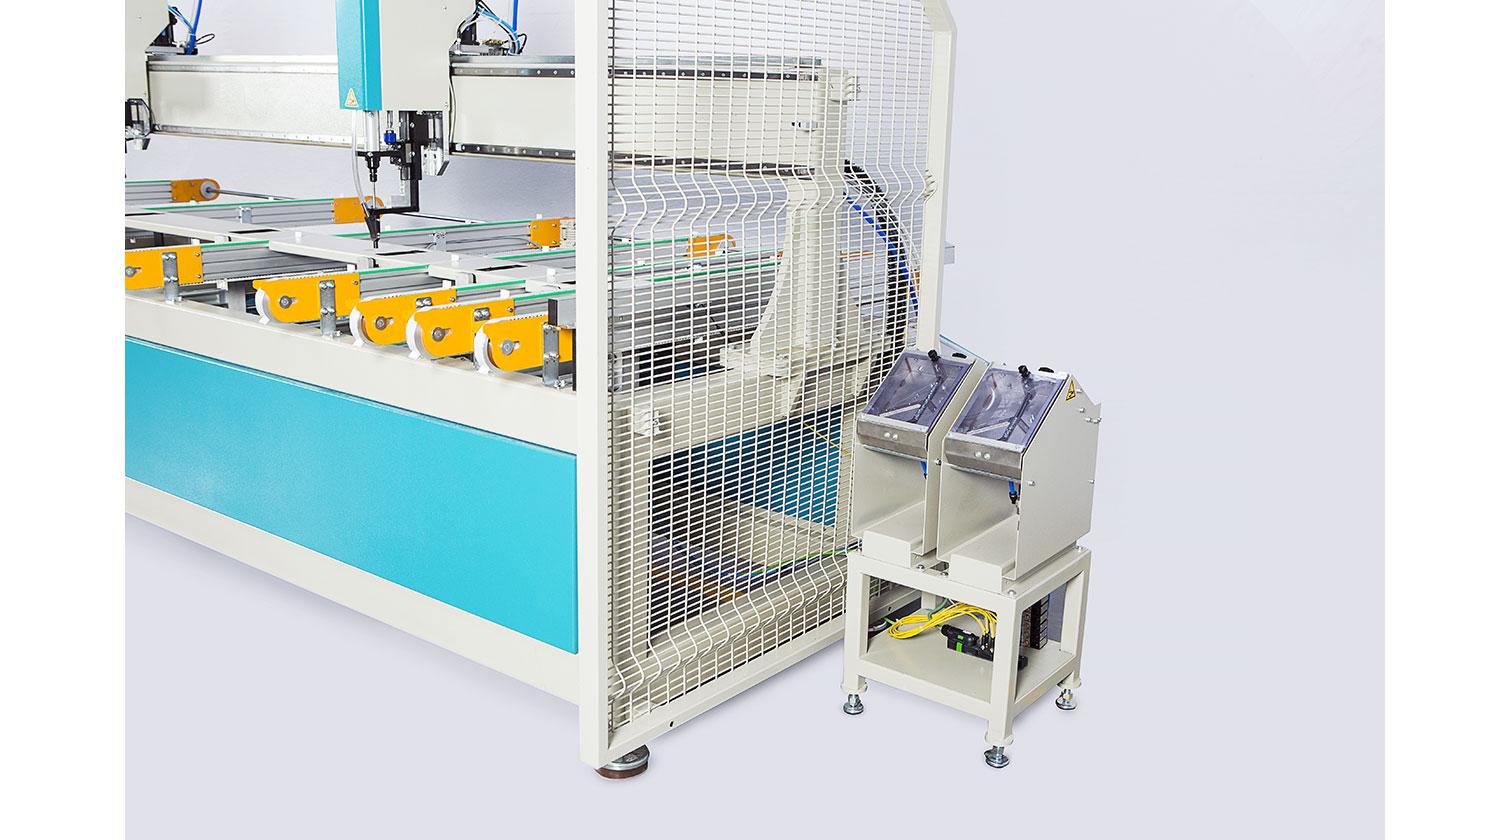 INT pvc reinforcement screwing Yilmaz SM 1000 screw feeders